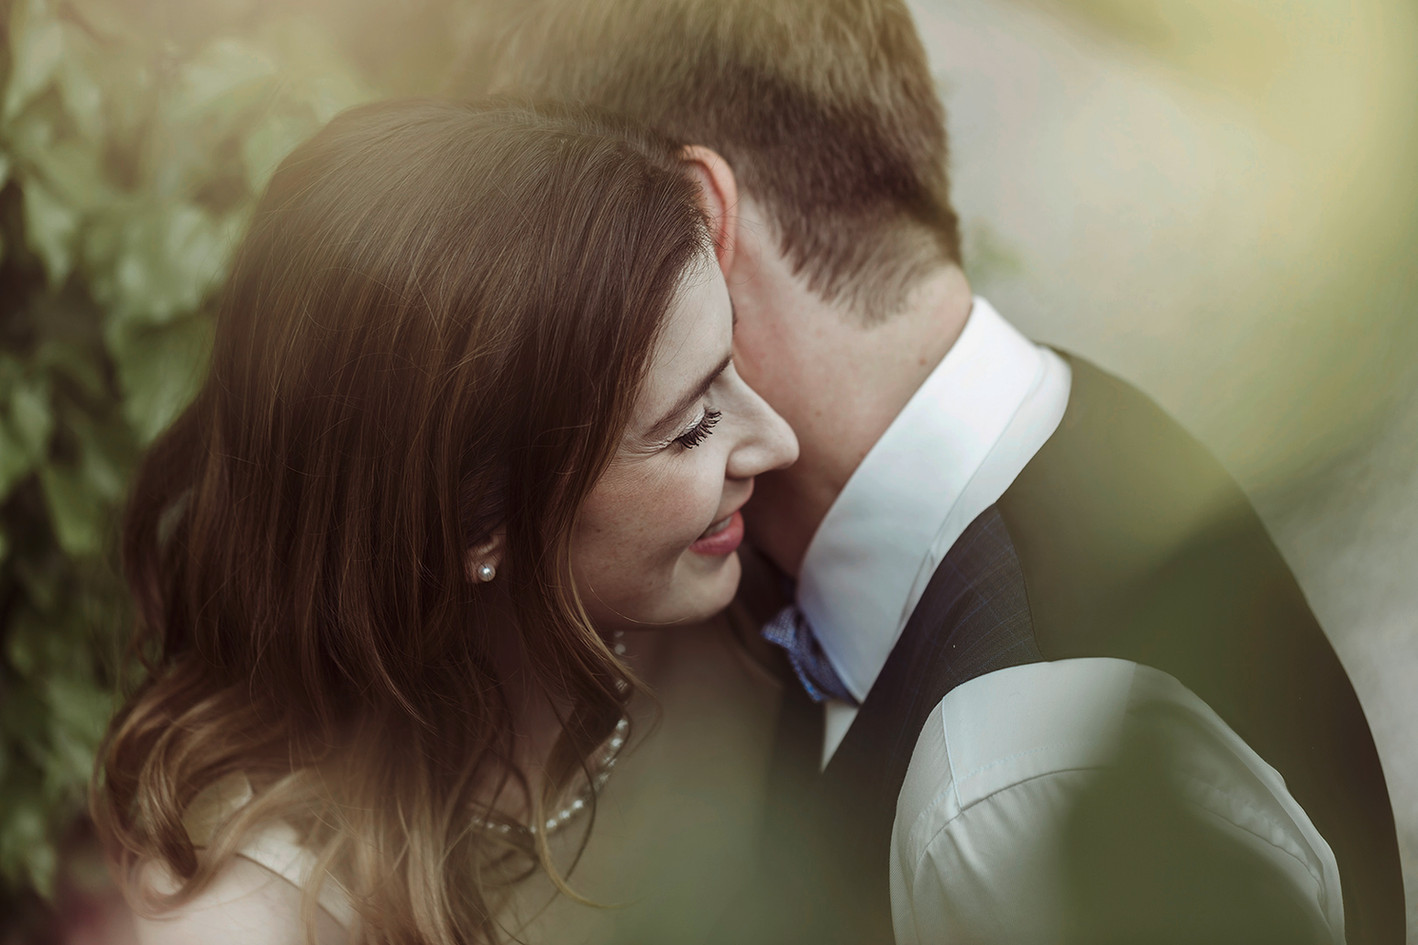 042-married-united-wedding-suephotoart-p